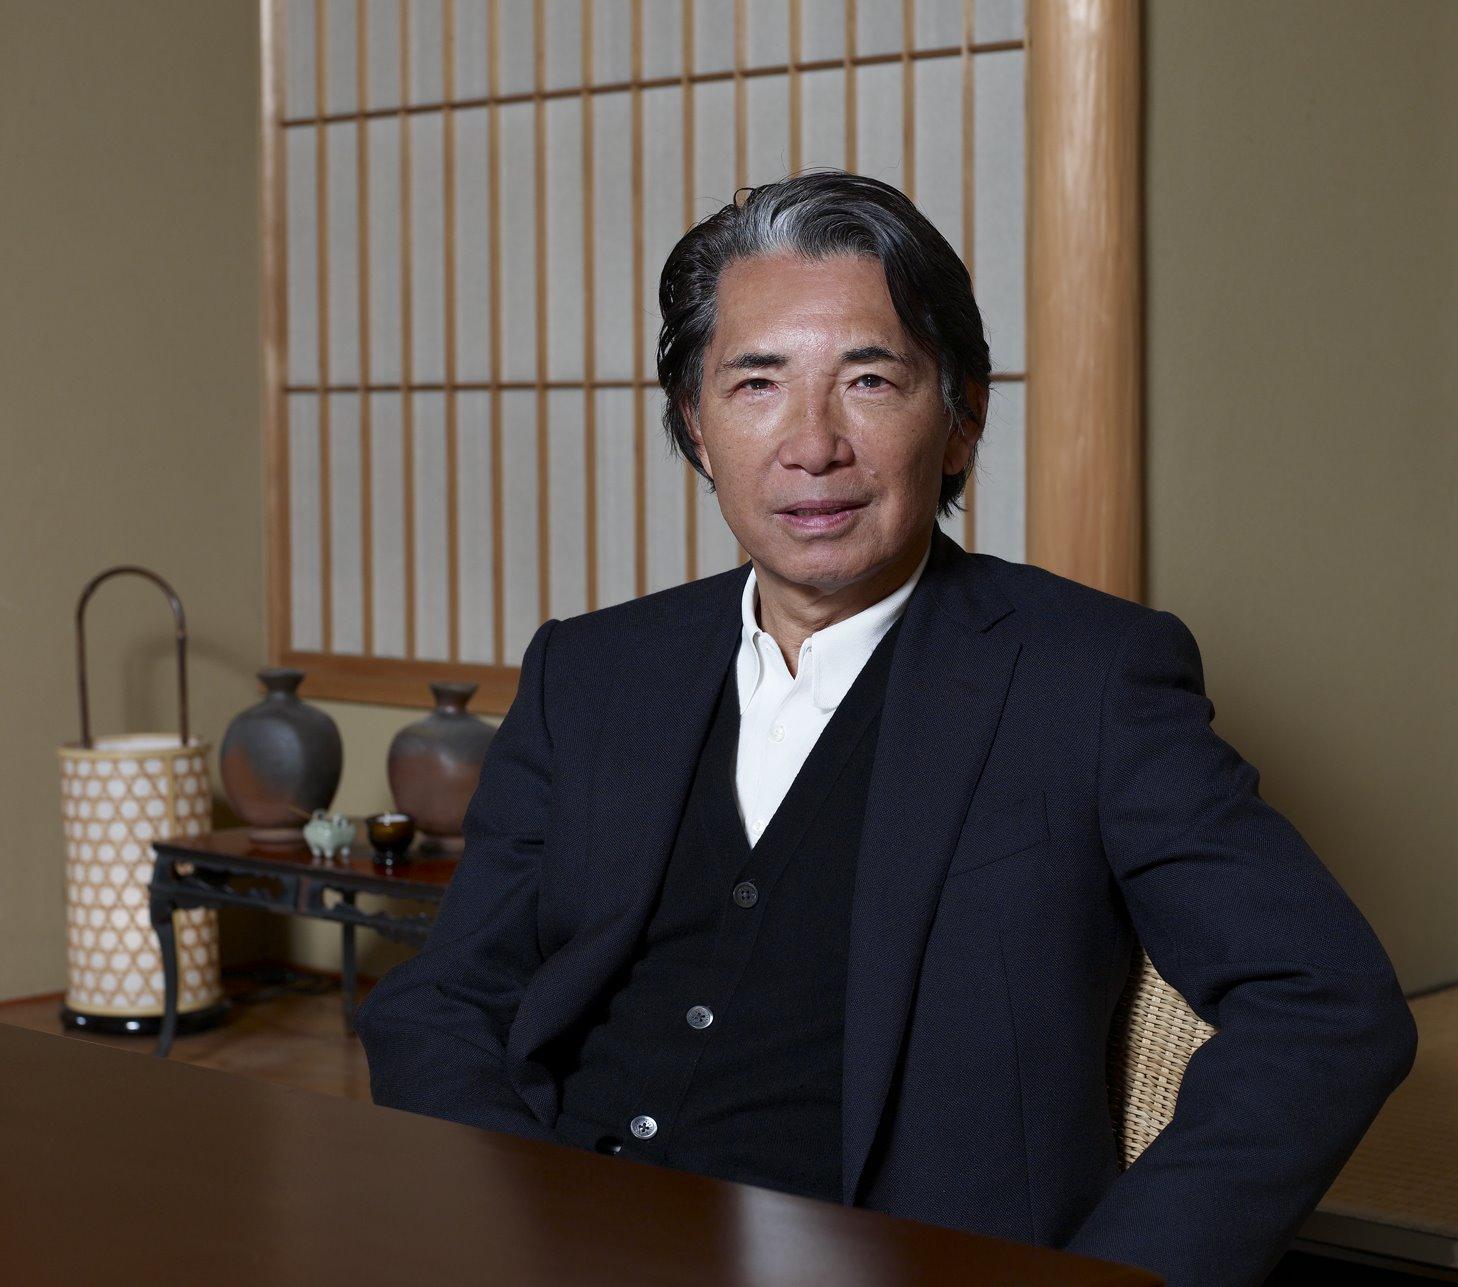 Кензо Такада - фото, биография